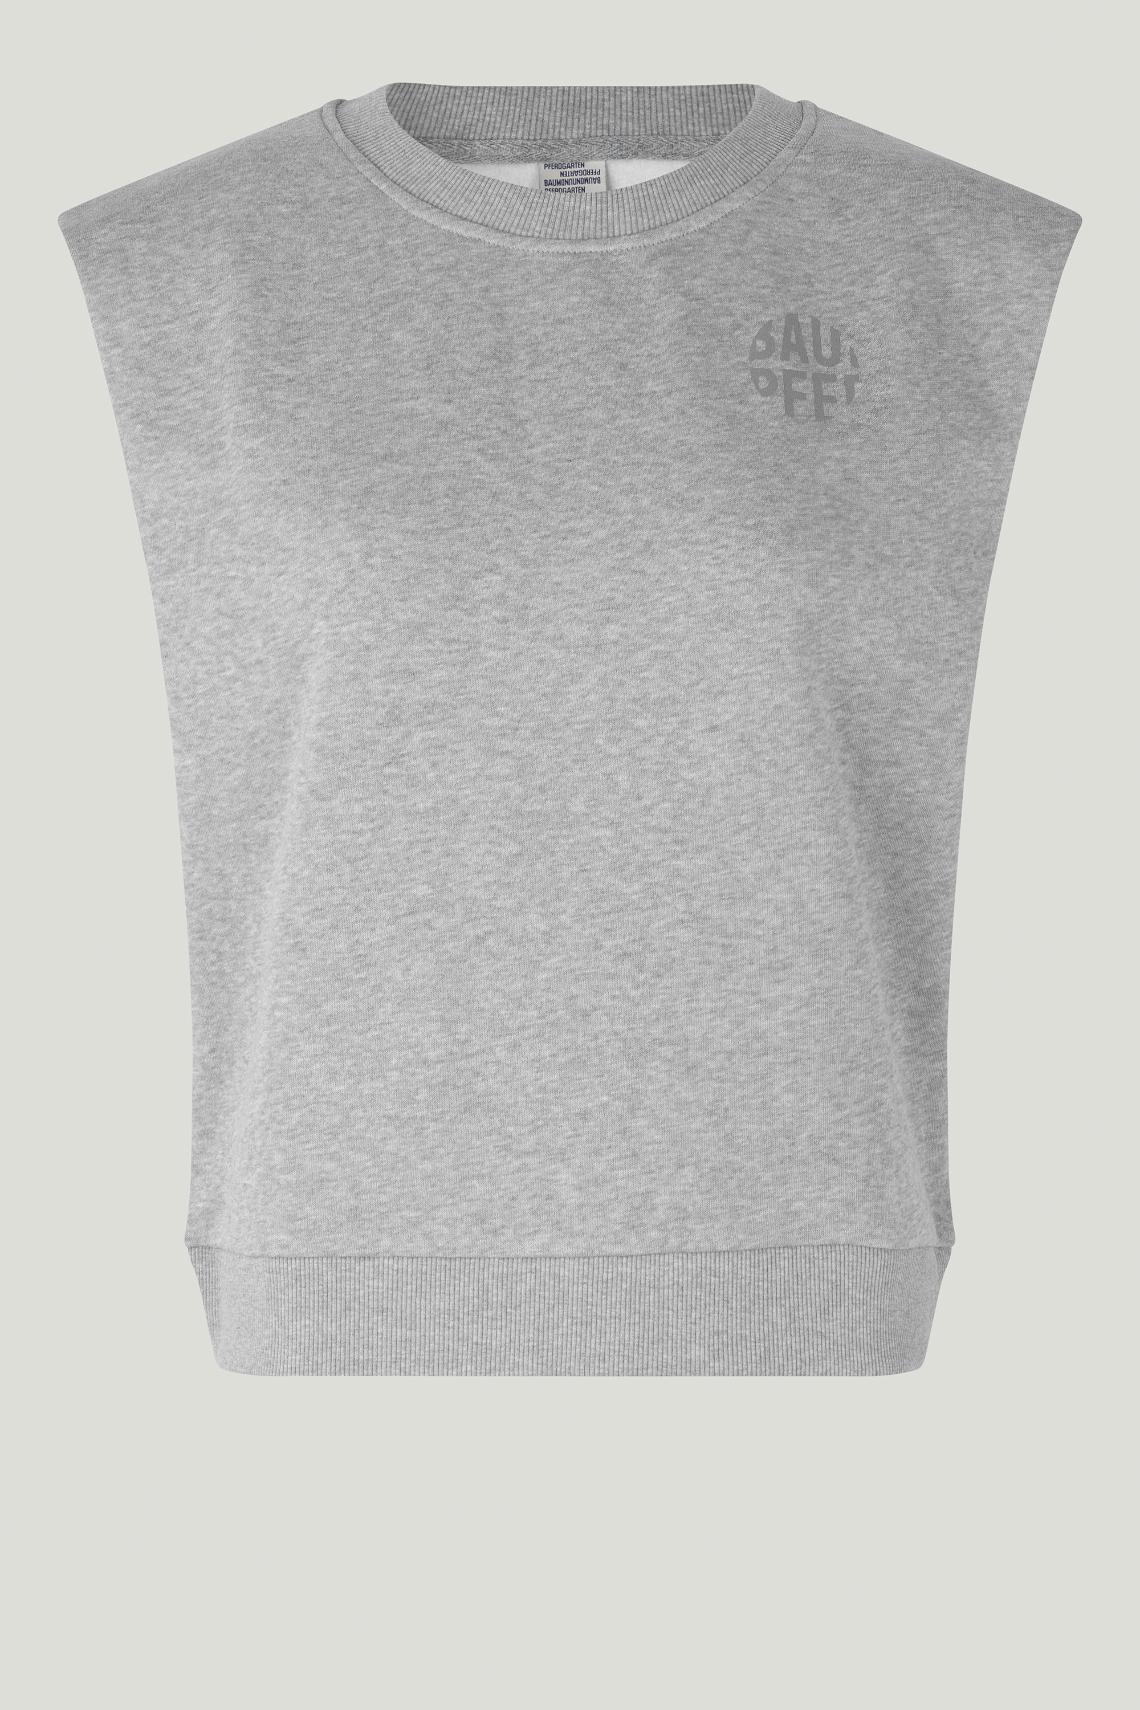 Sweat Jaey grey-1